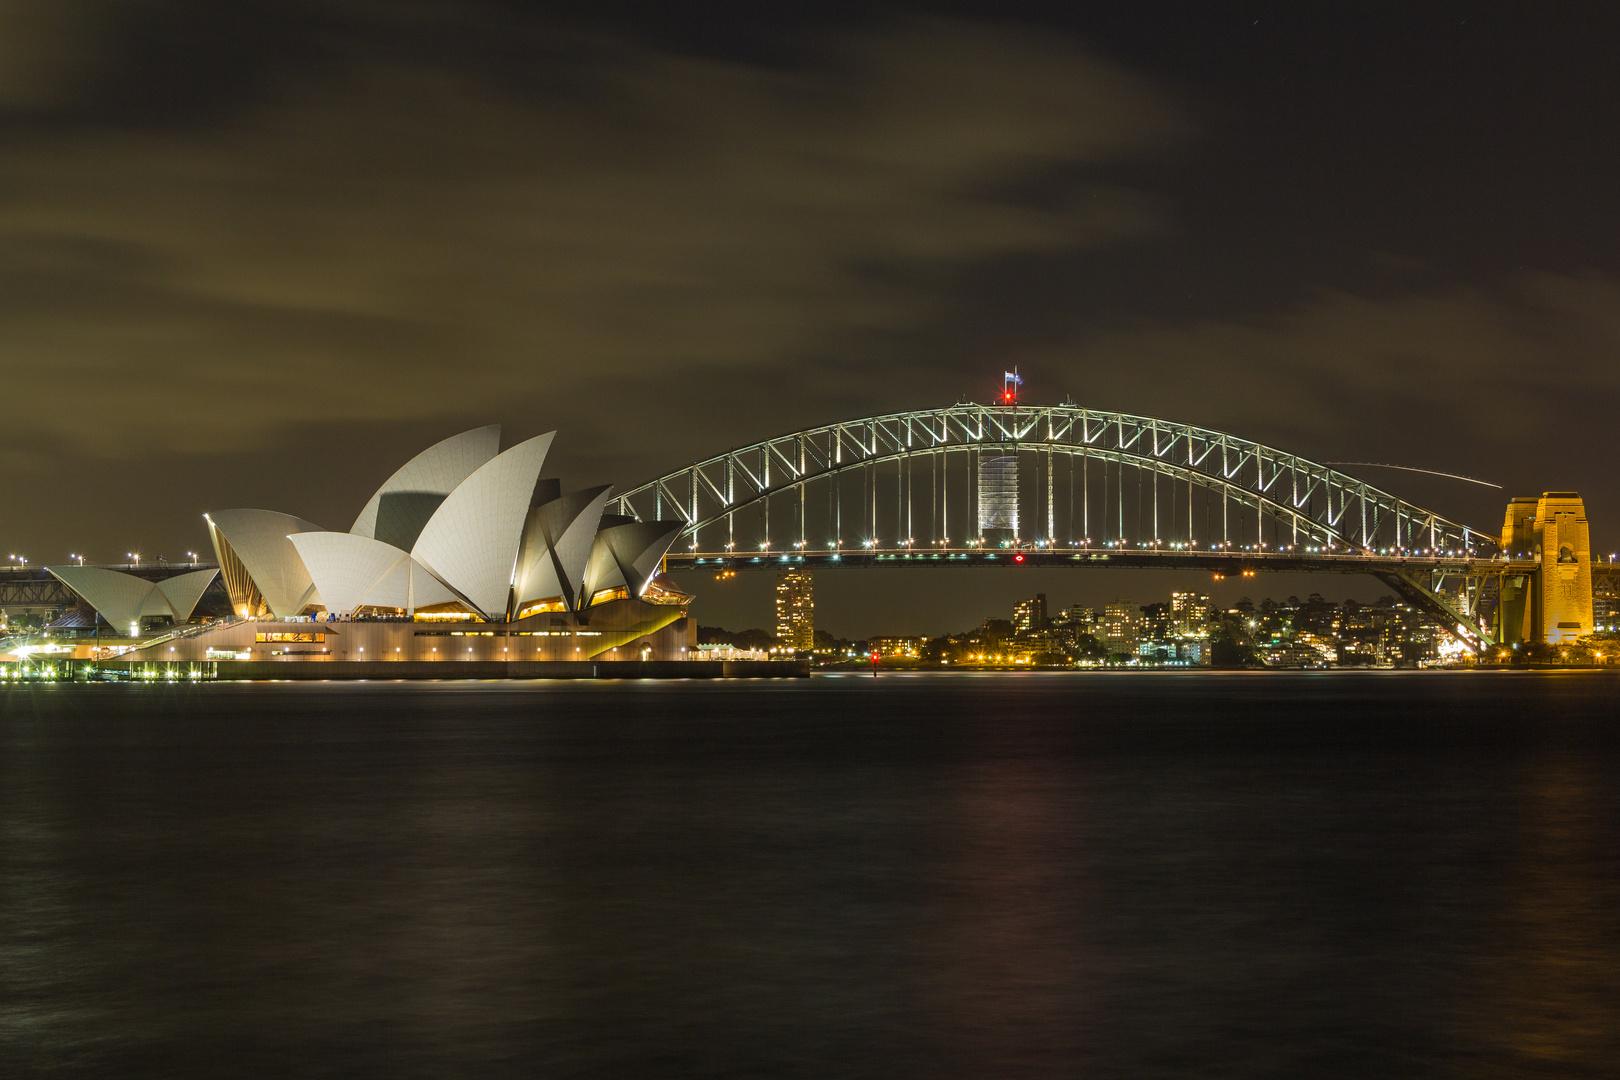 Sydney Oper + Harbour Bridge